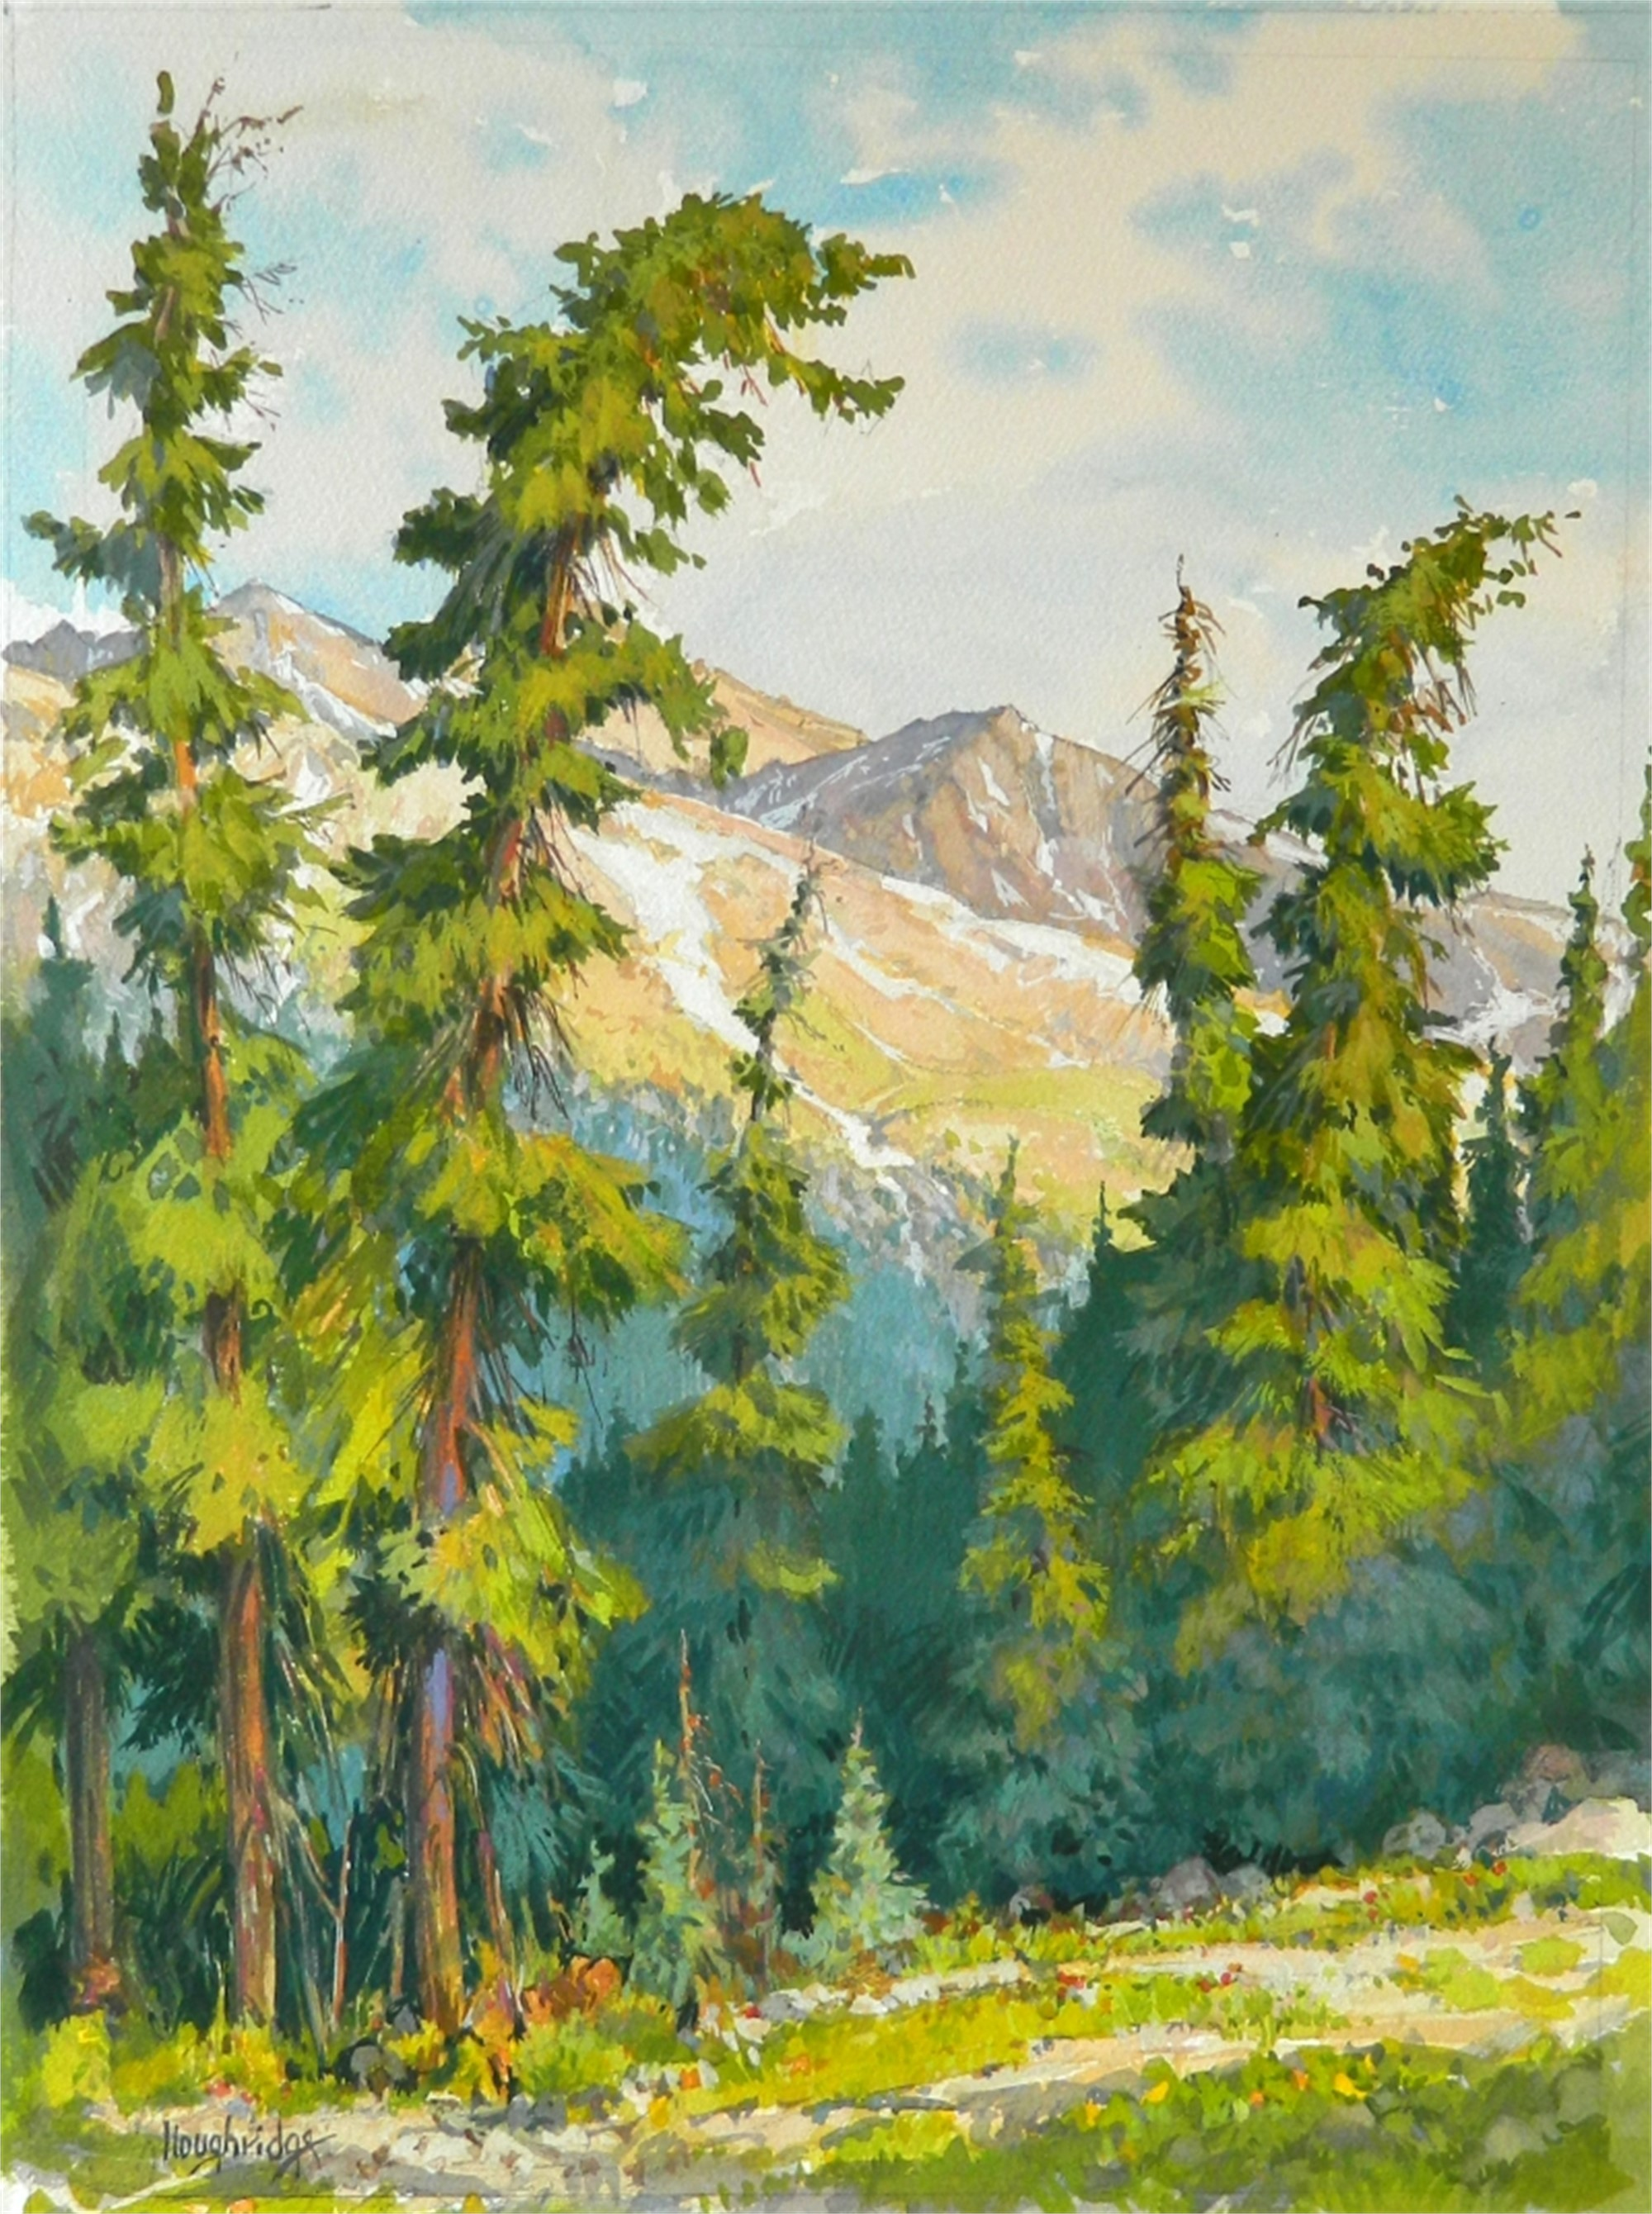 Along Hoosier Pass by Leon Loughridge